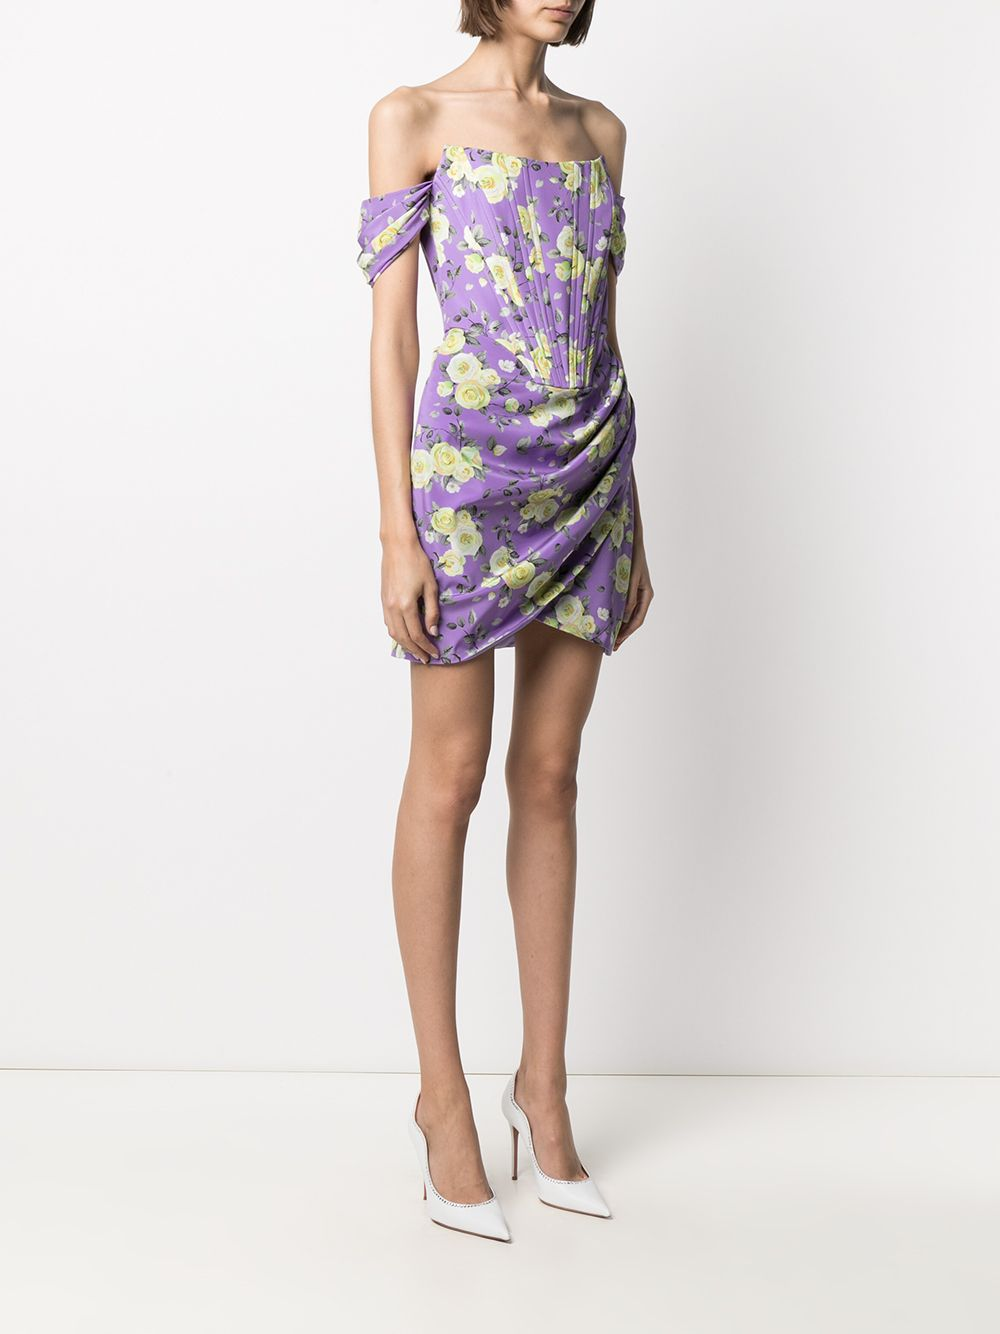 GIUSEPPE DI MORABITO | Dress | 177DR-127ST12-24